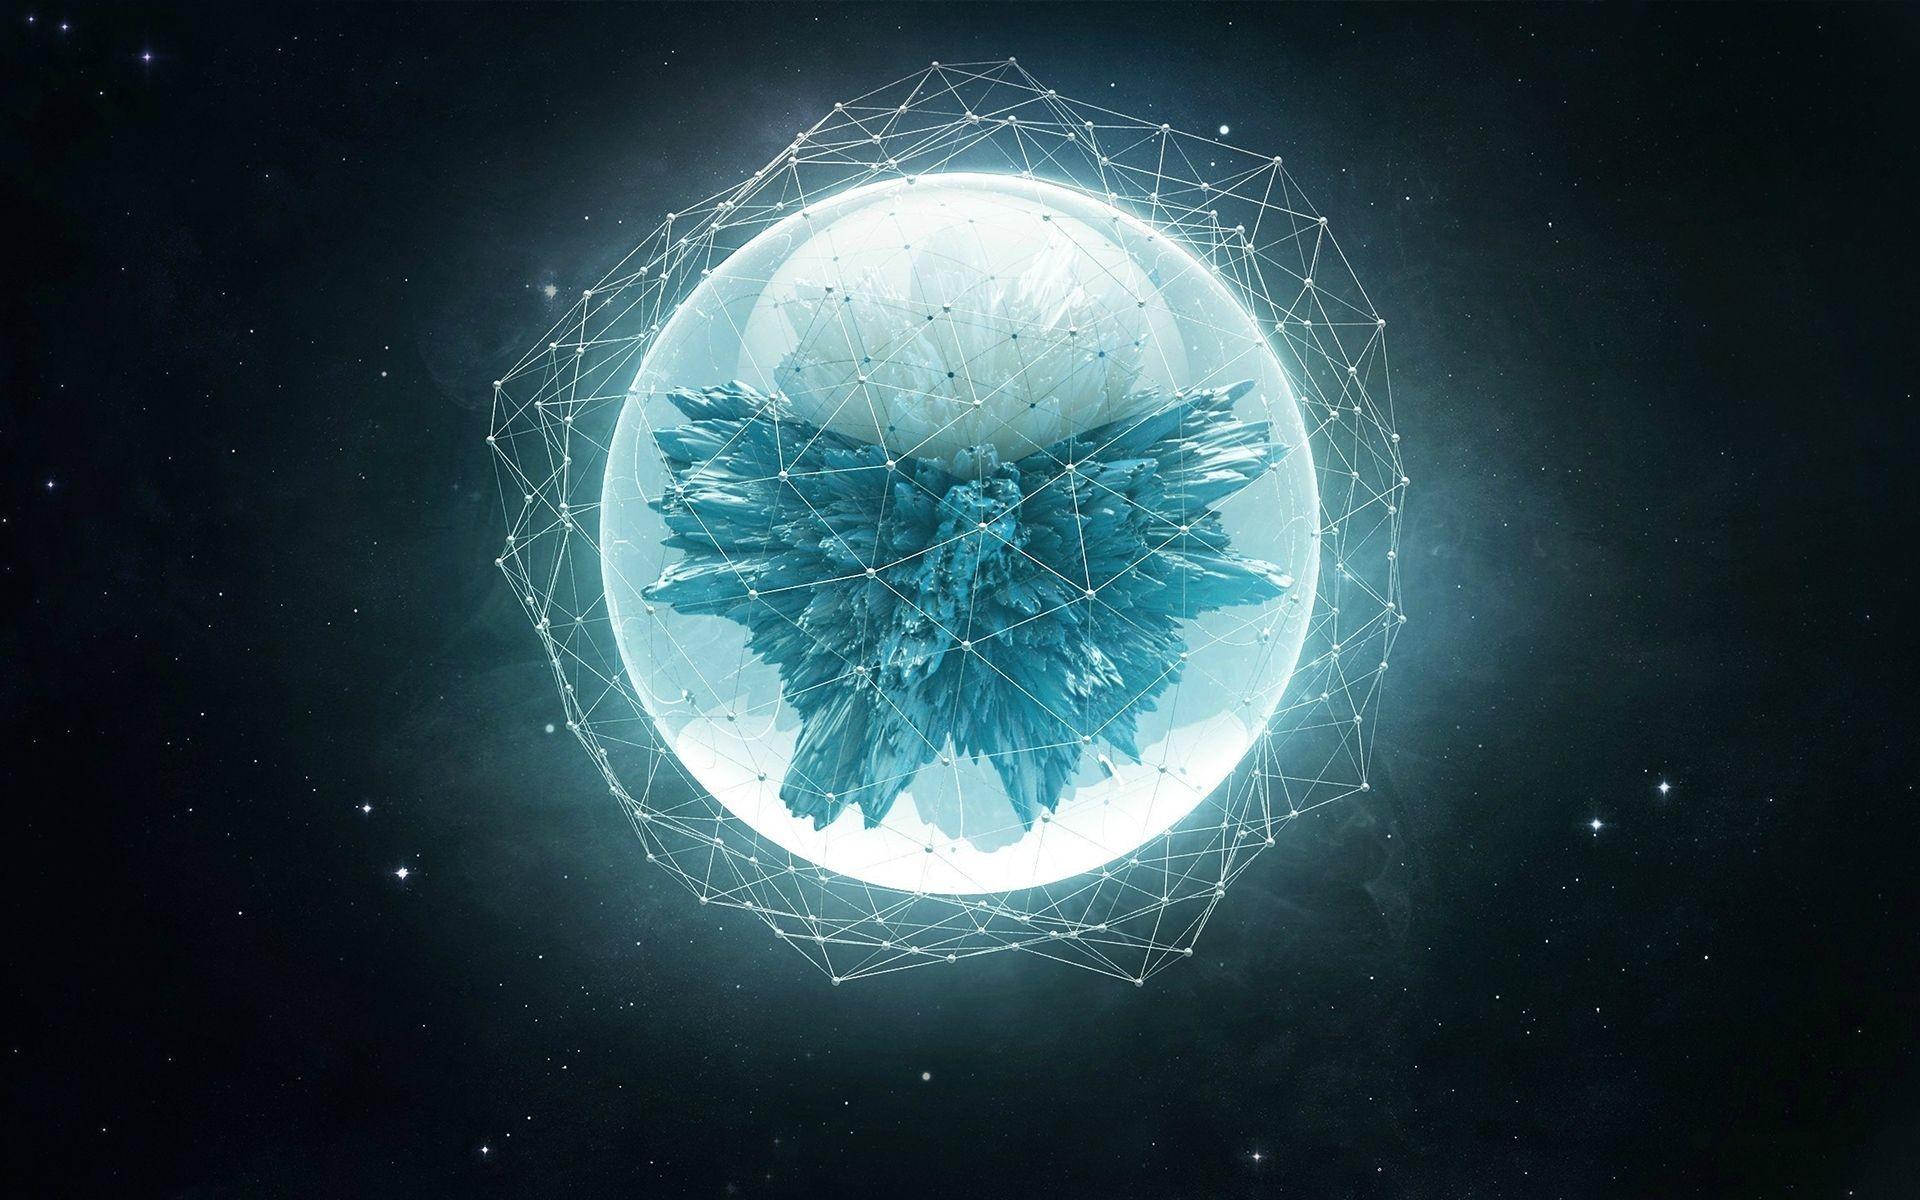 Wallpaper Abstract Earth Nebula Circle Star Trails